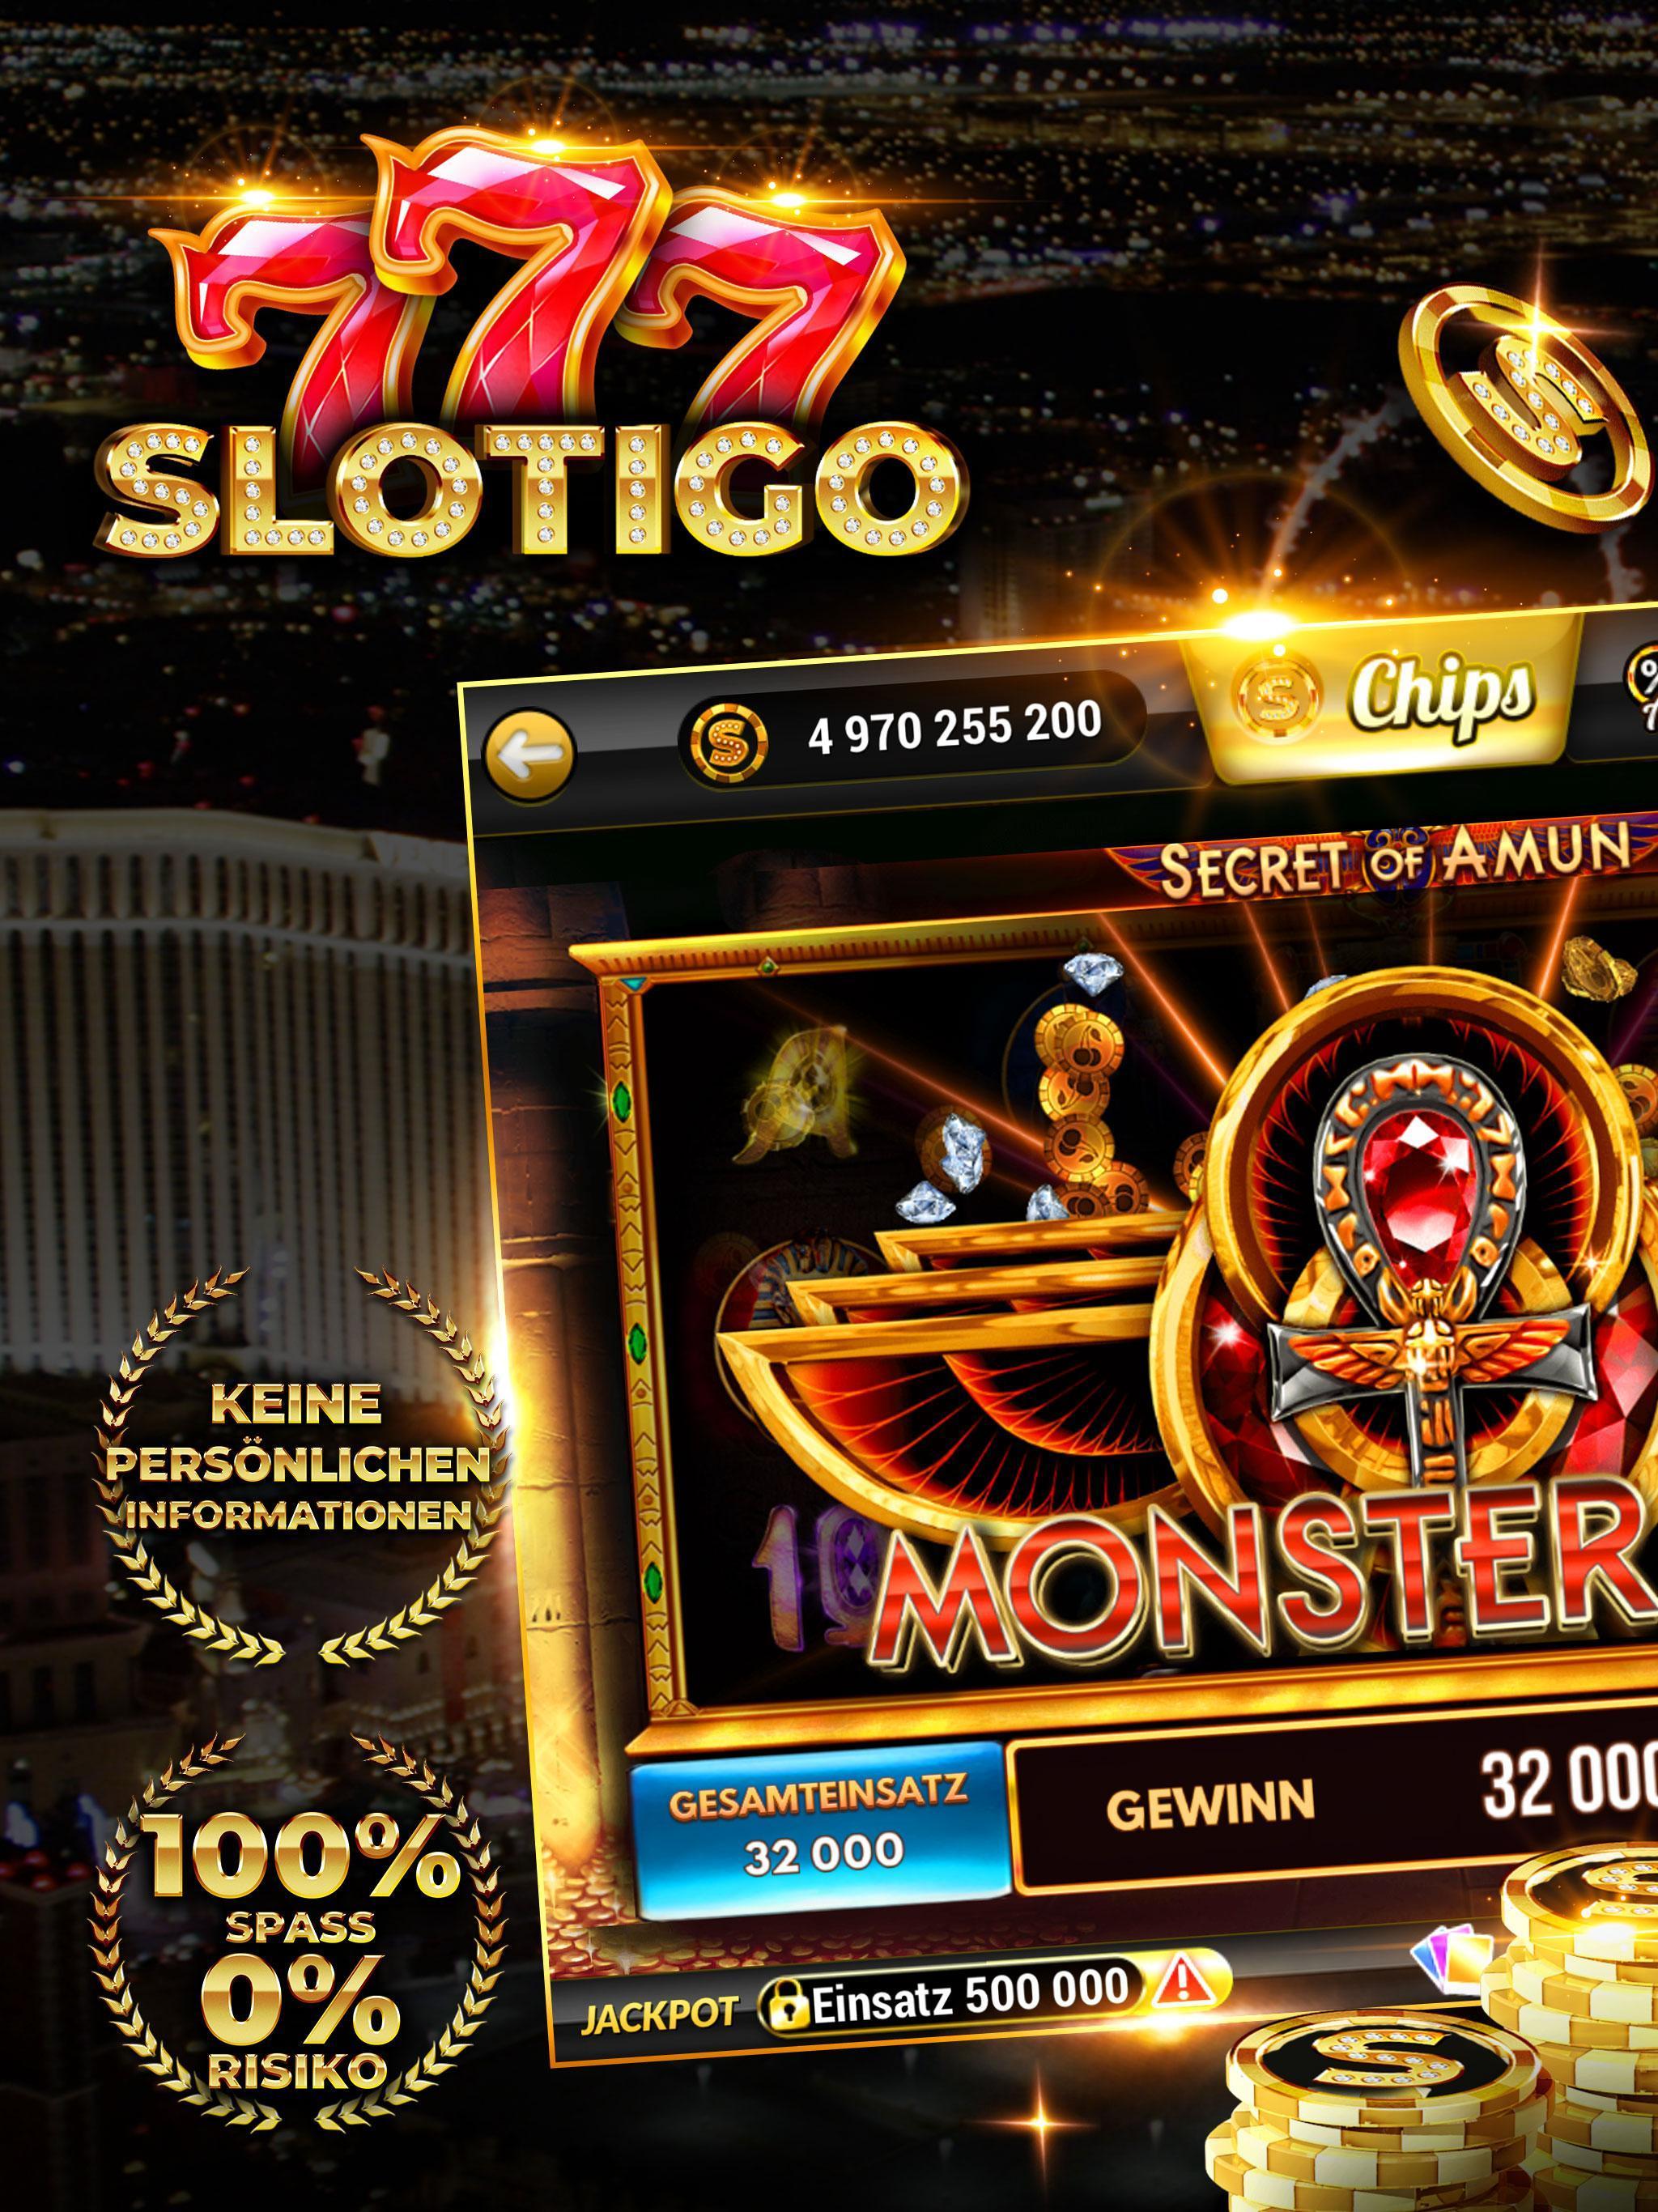 Slotigo Online-Casino, Spielautomaten & Jackpots 4.11.11 Screenshot 6